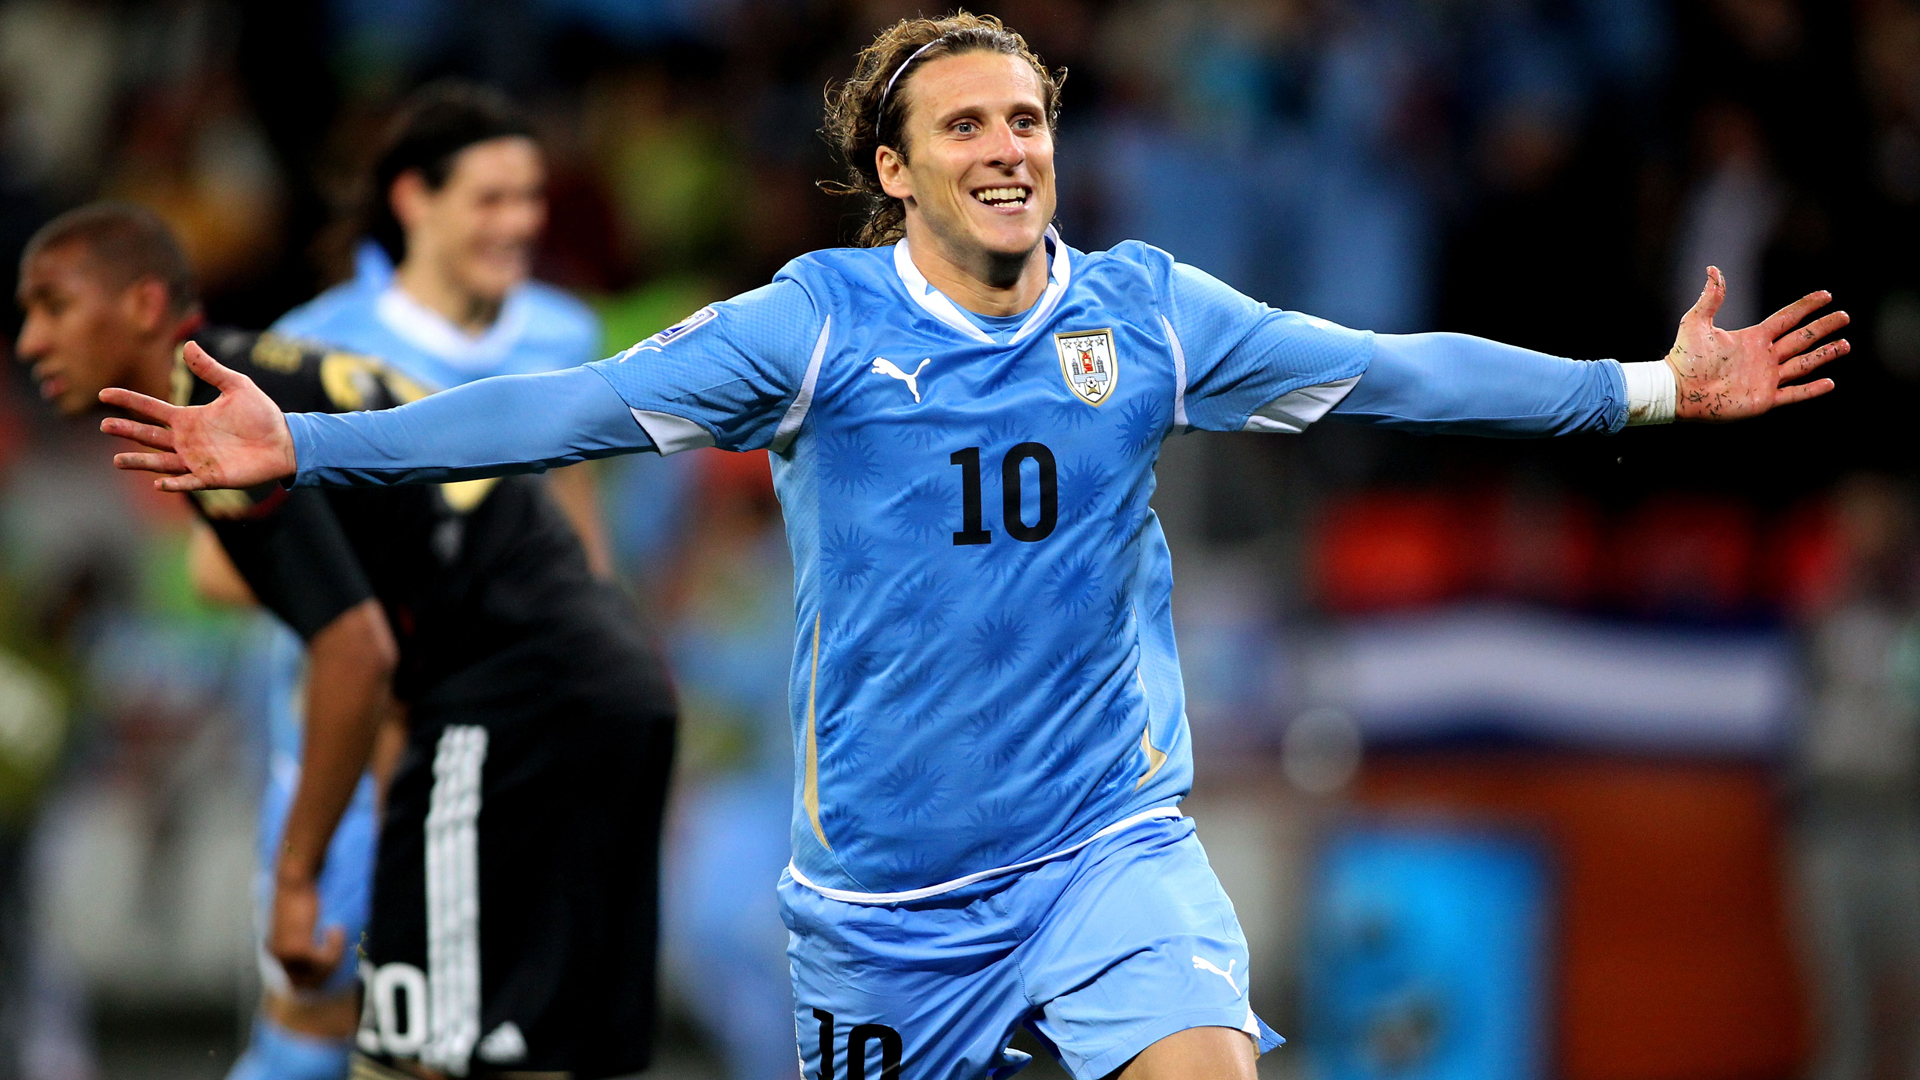 Former Uruguay, Man United forward Forlan retires